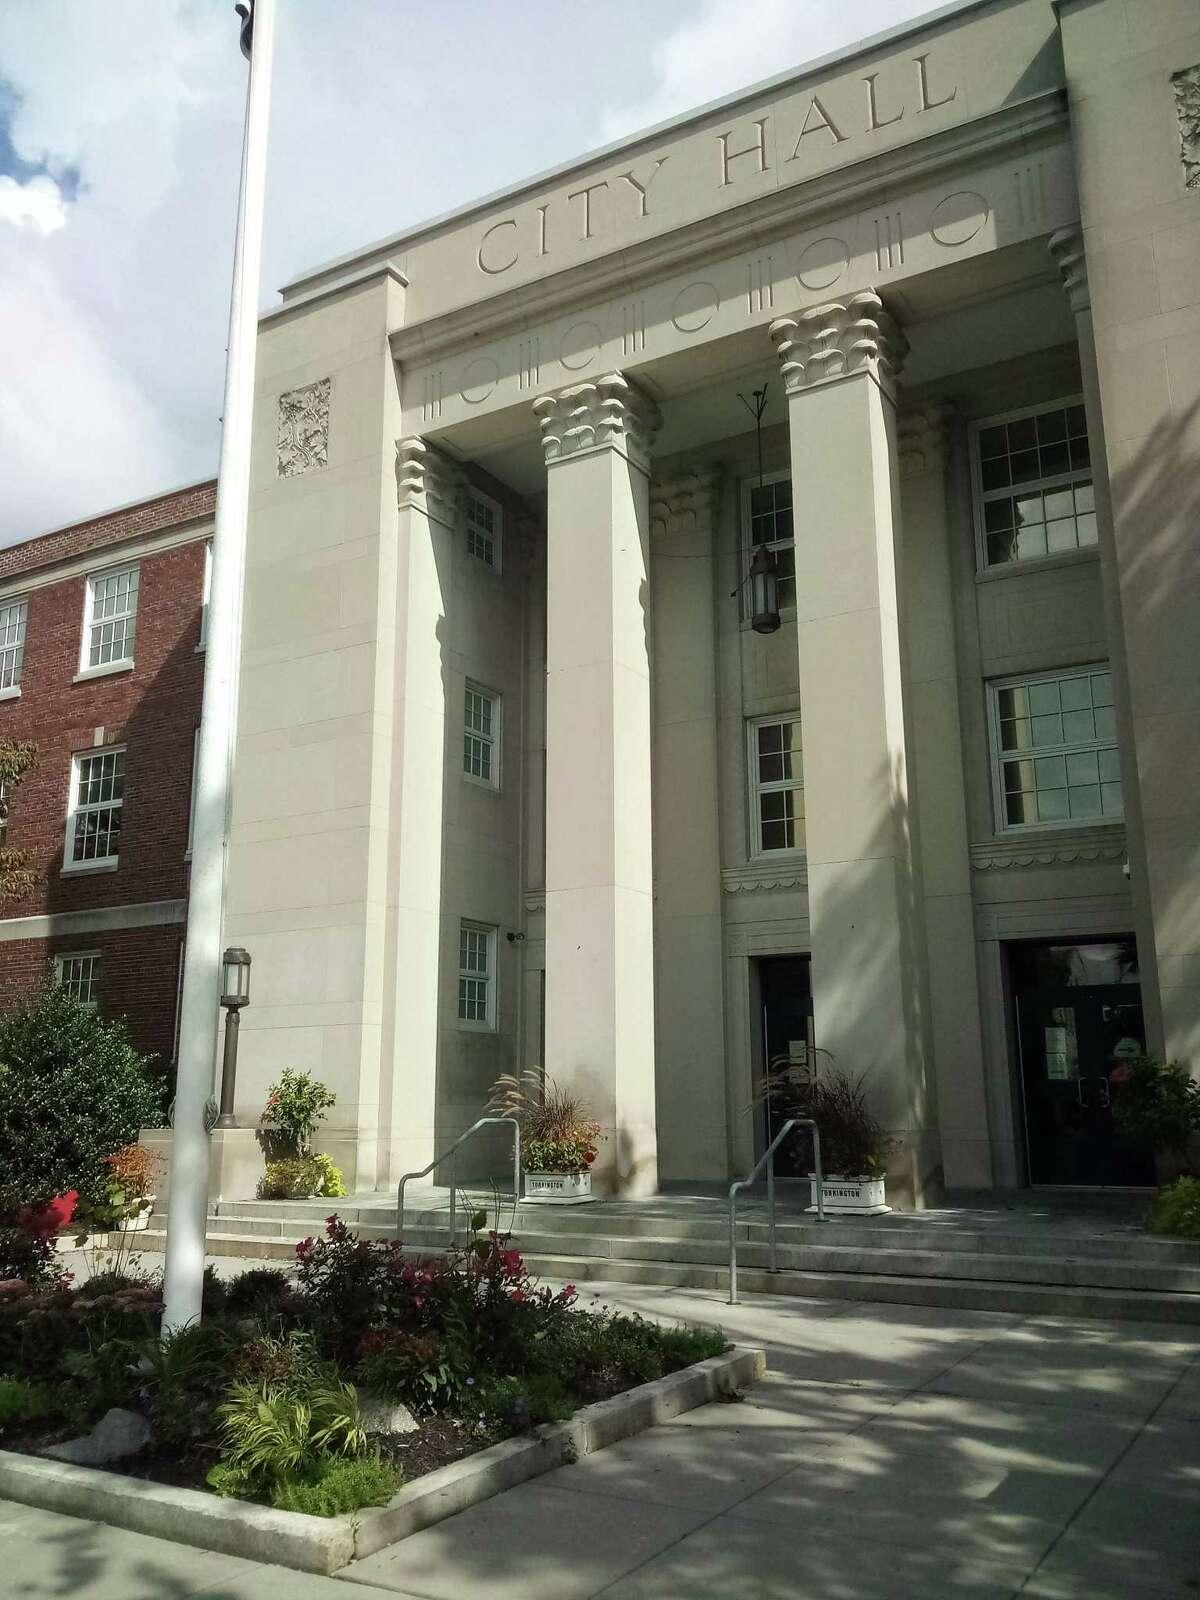 City Hall at 140 Main St., Torrington.